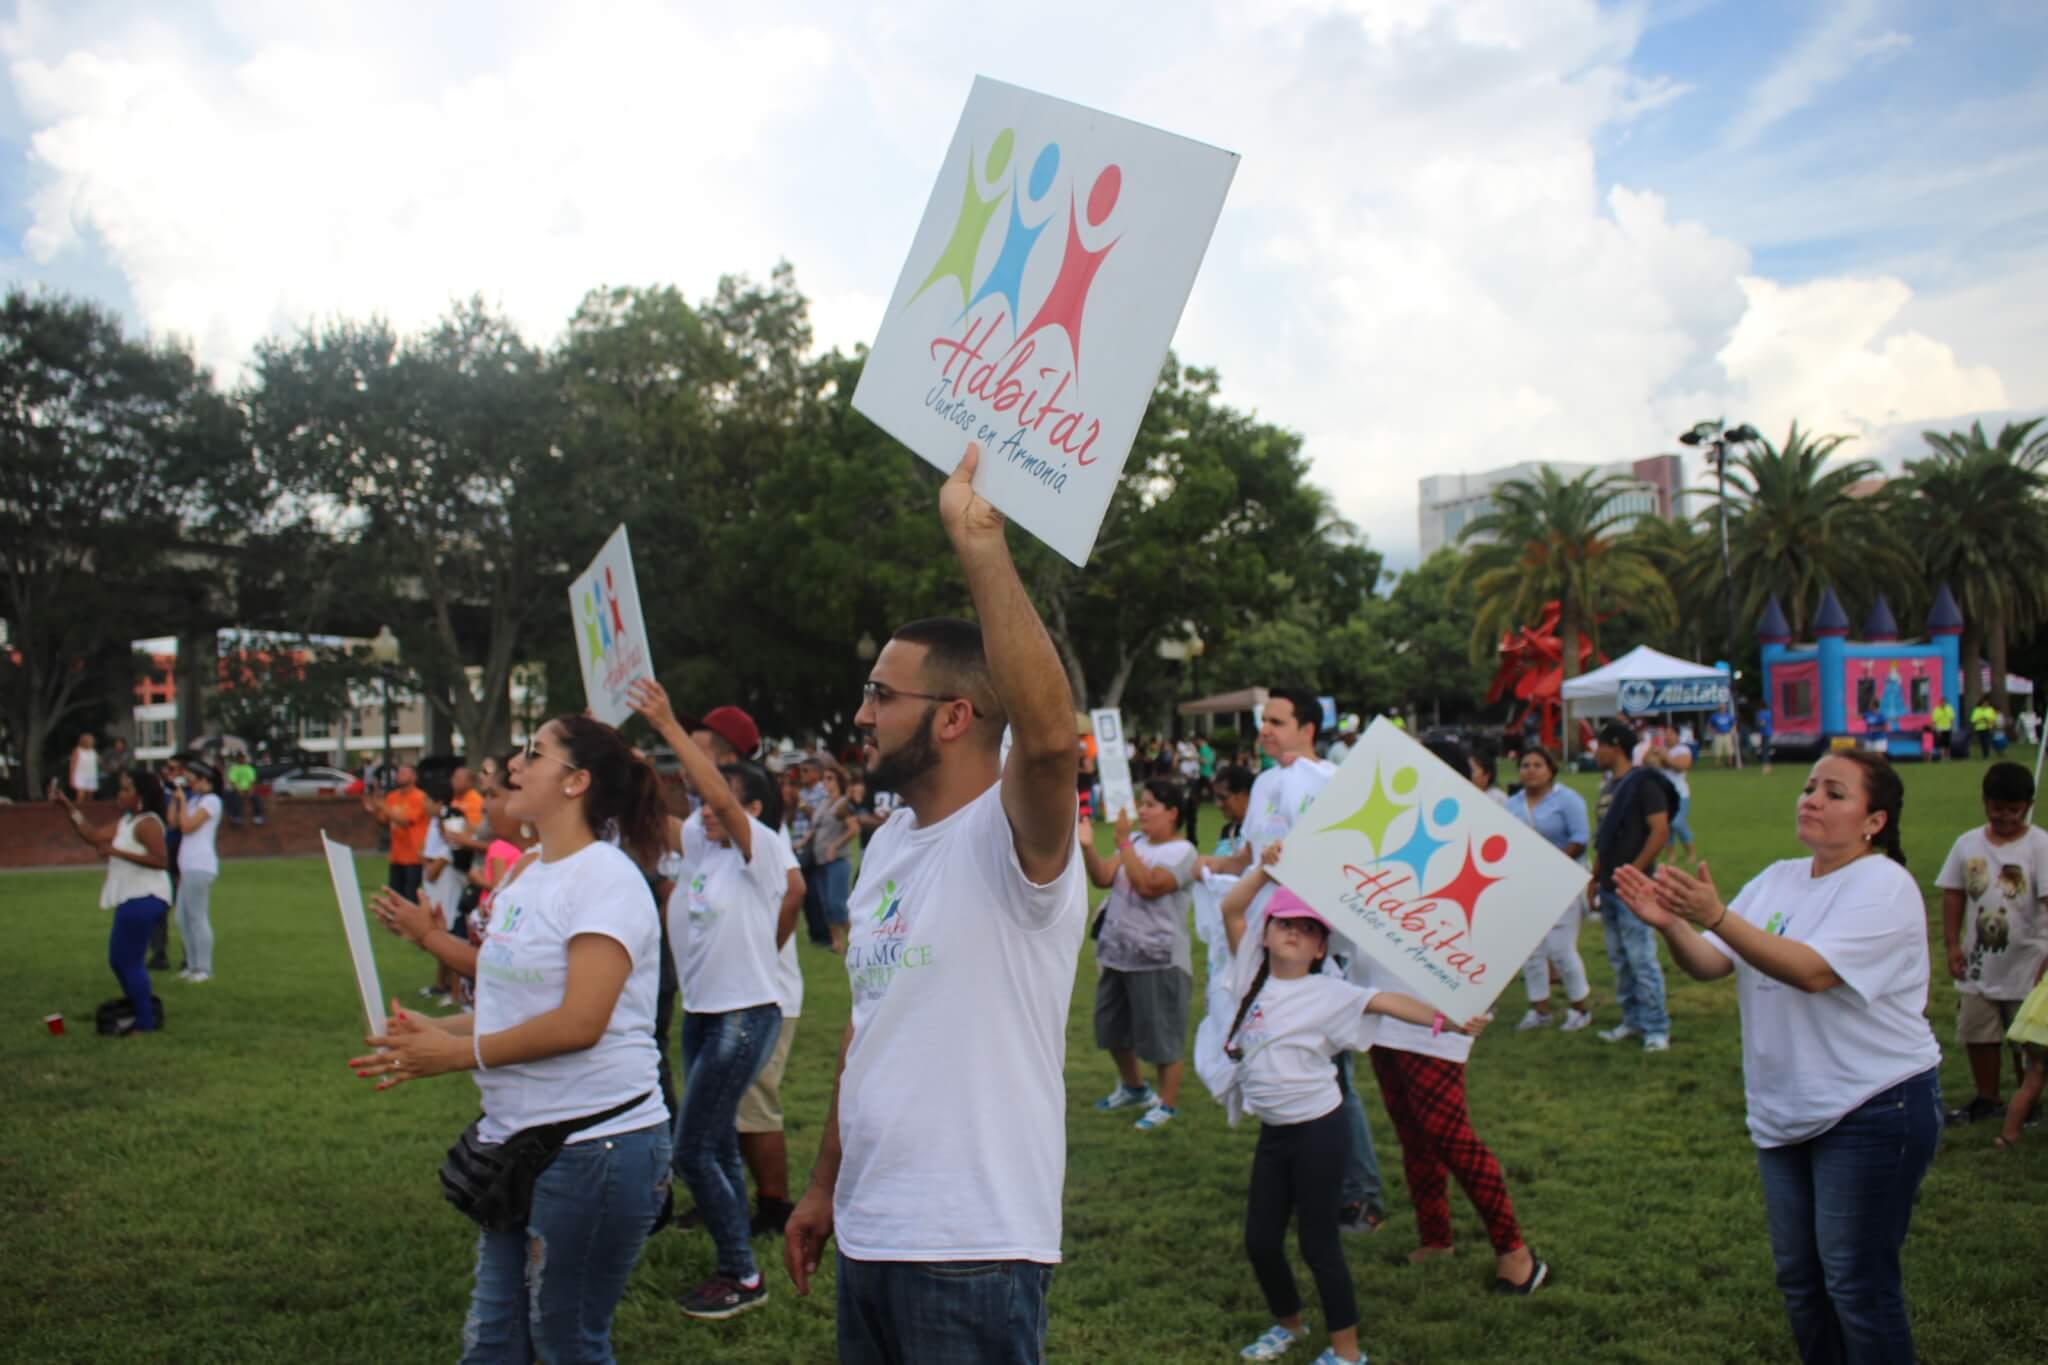 Hispanic festival brings unity to SWFL